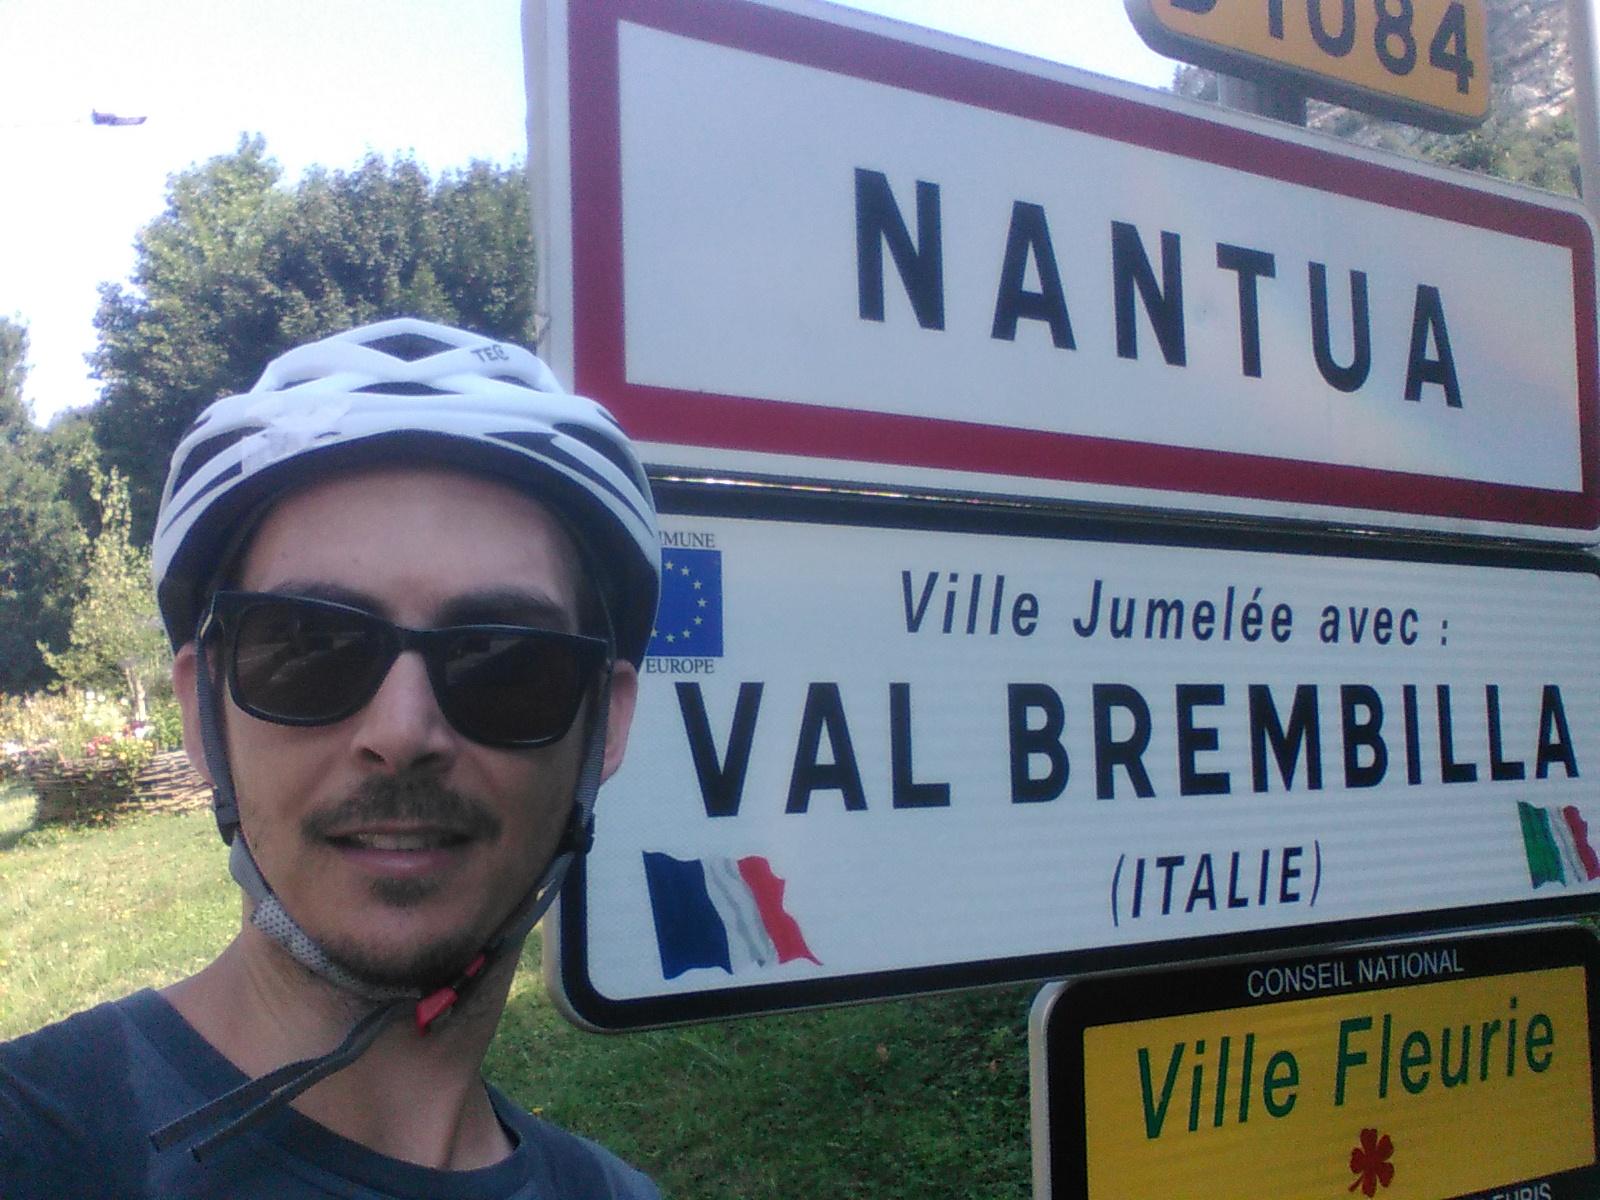 1ère section : Genève-Nantua-Maillat